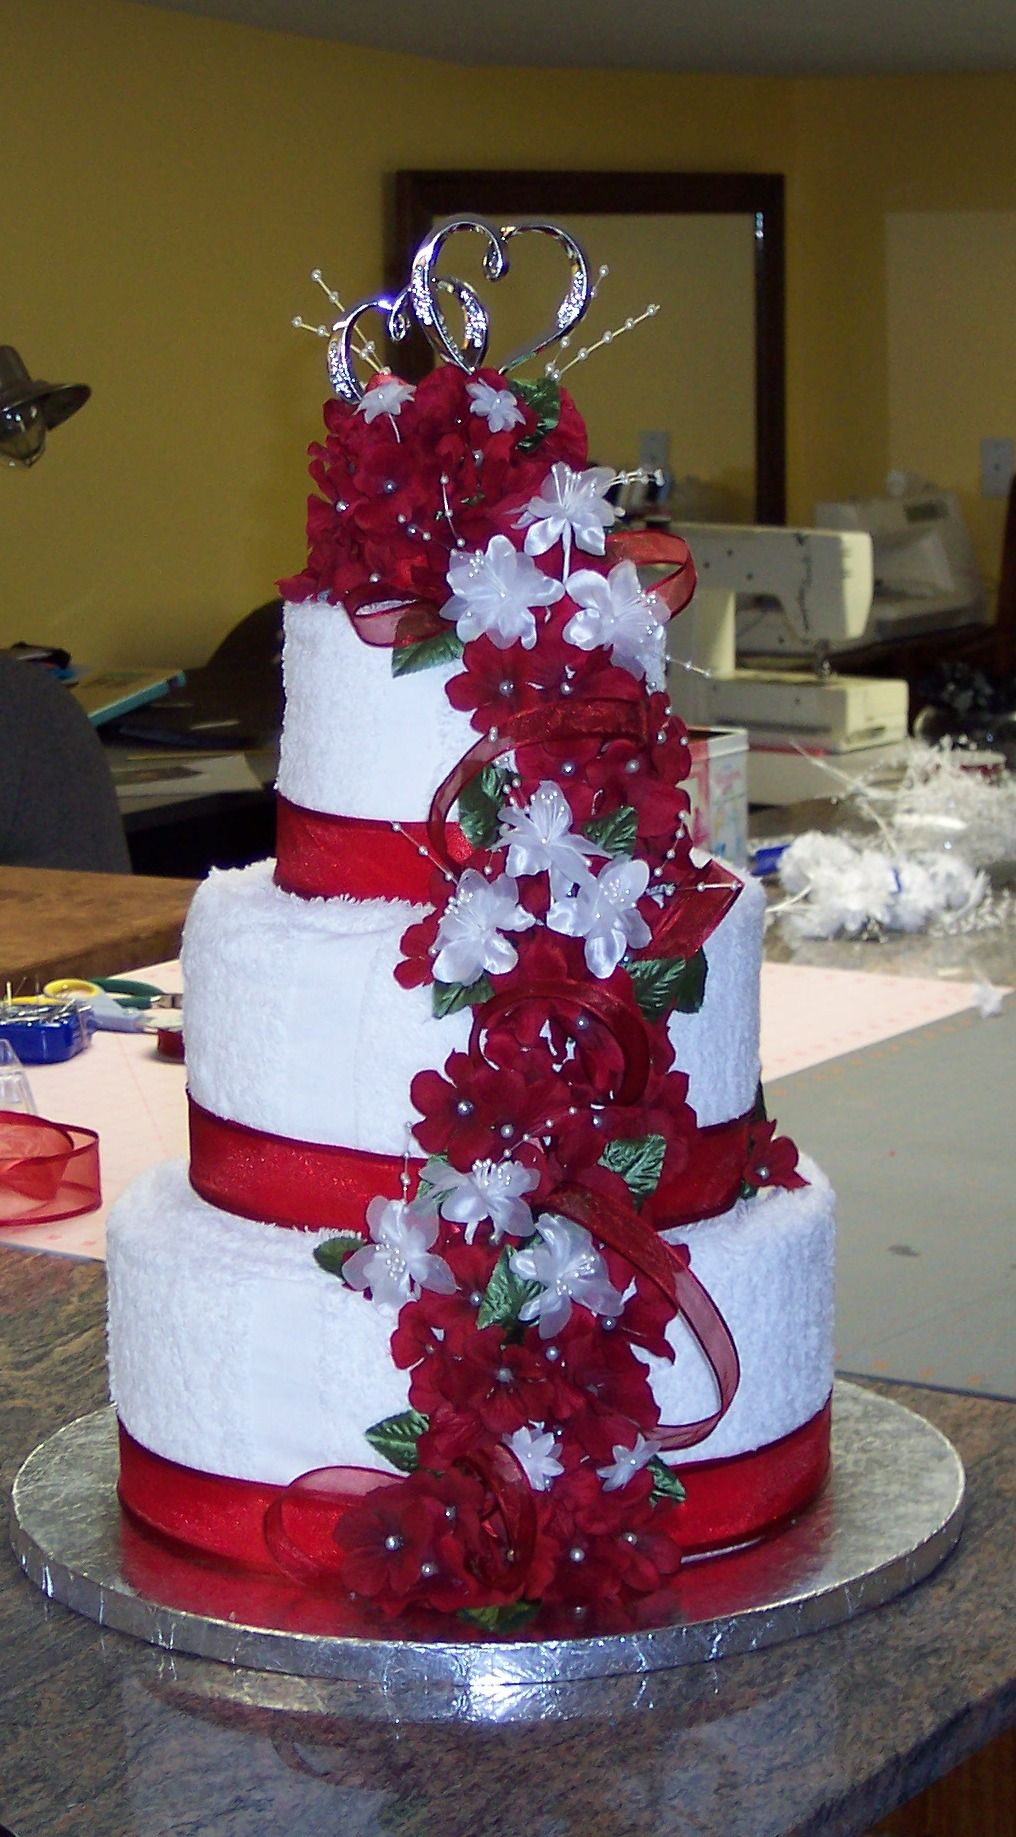 Towel cake for my niece's wedding shower. Towel cakes